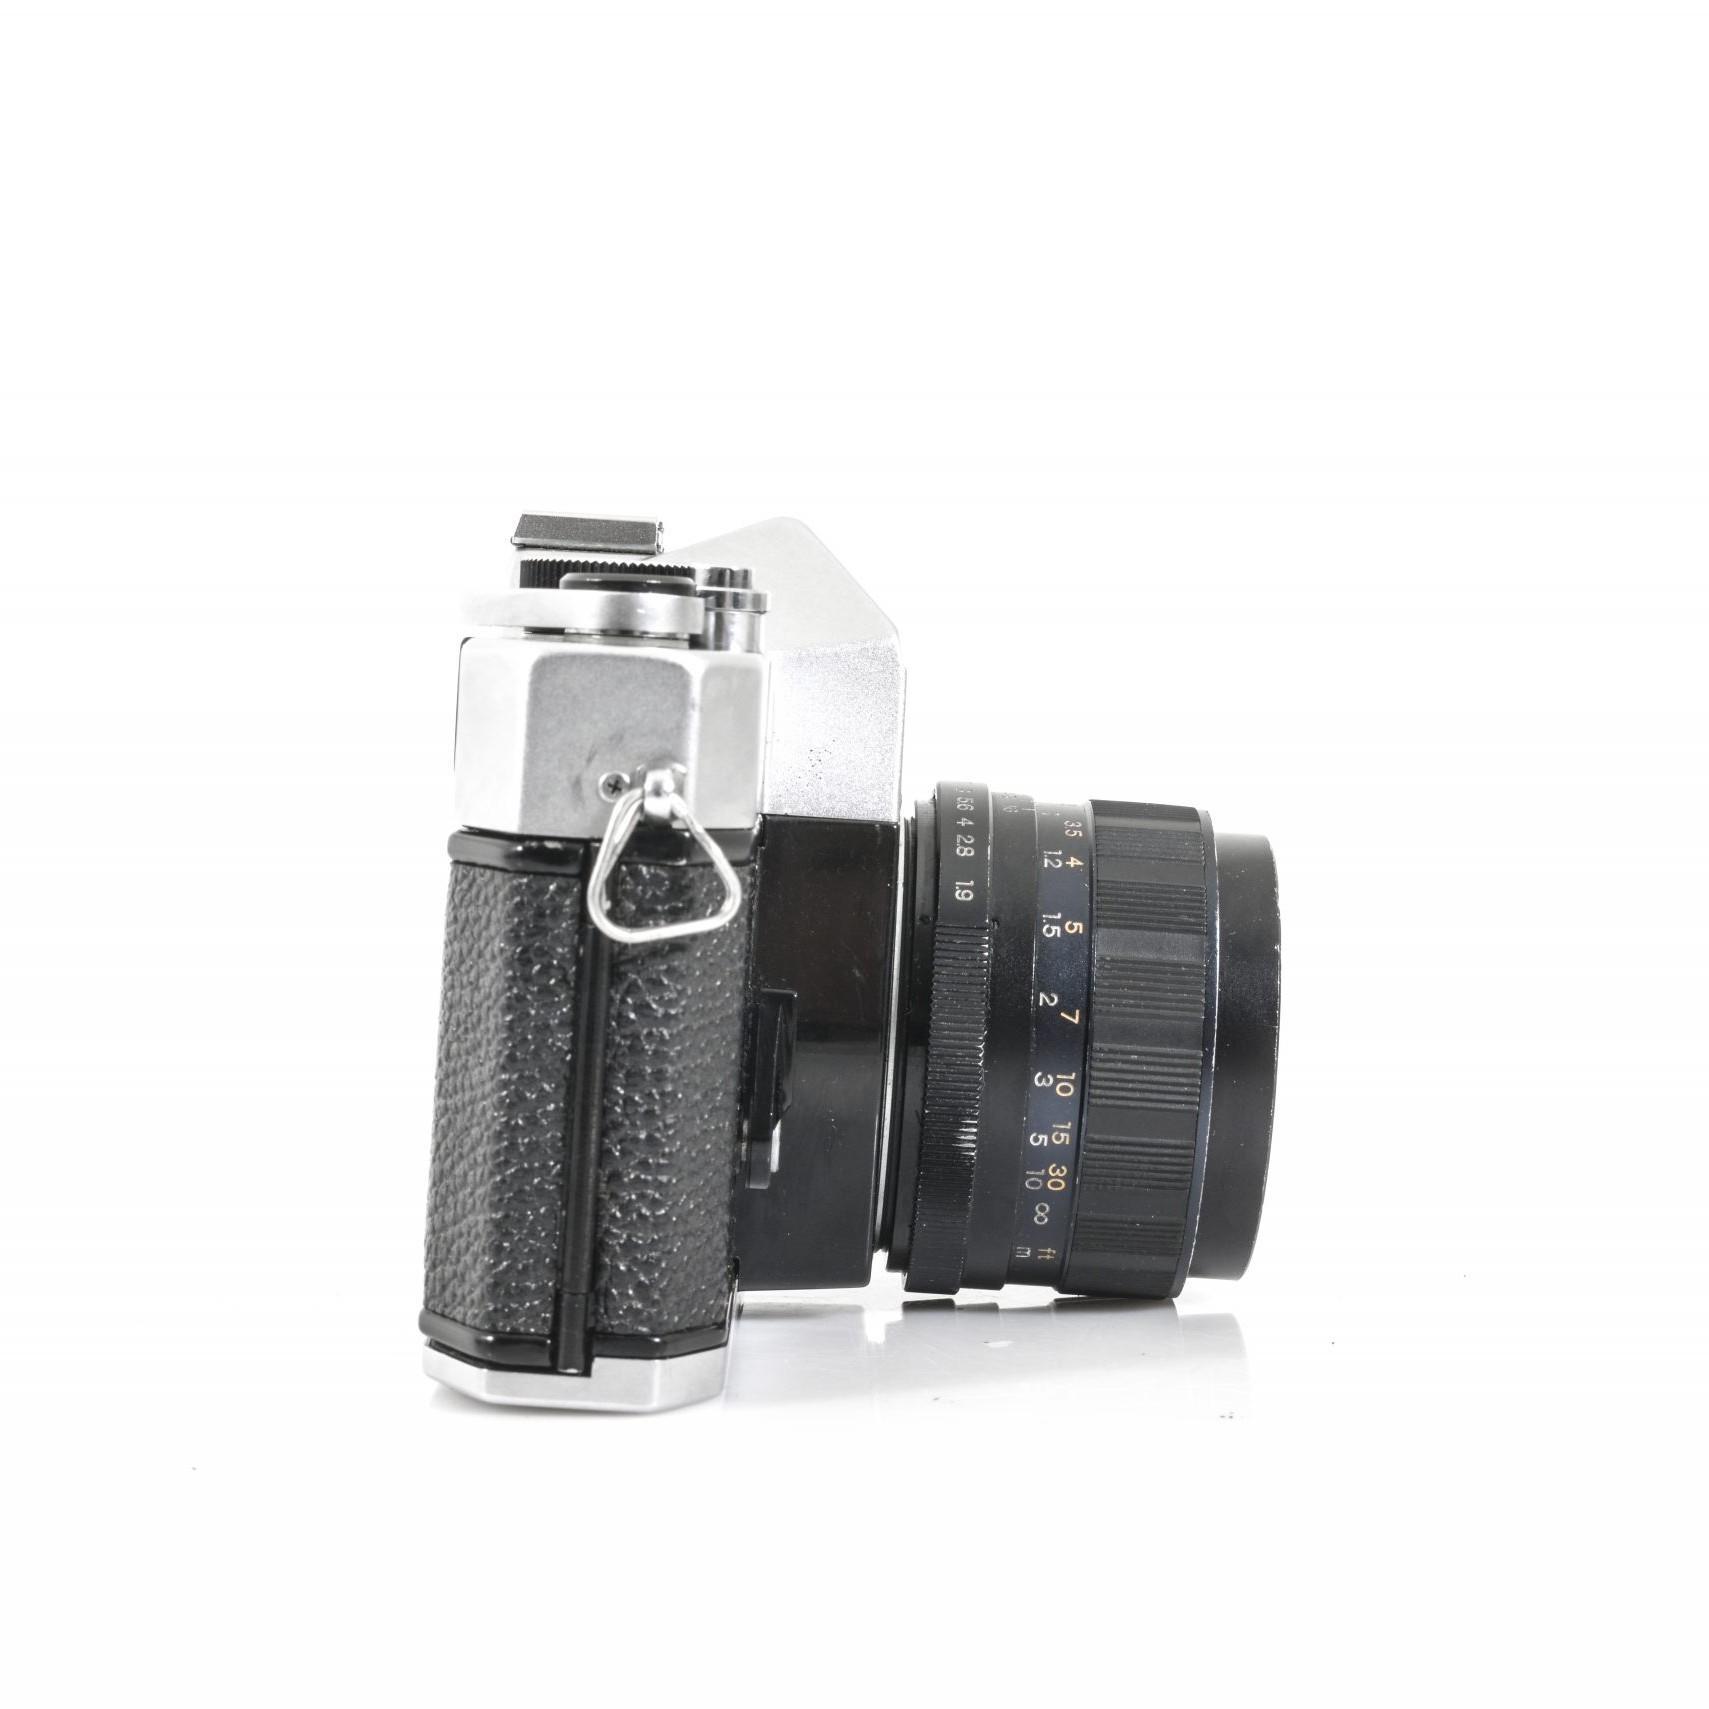 Yashica TL-ELECTRO 35mm SLR Film Camera + Yashinon-DS 50mm F1.9 Lens Lomo